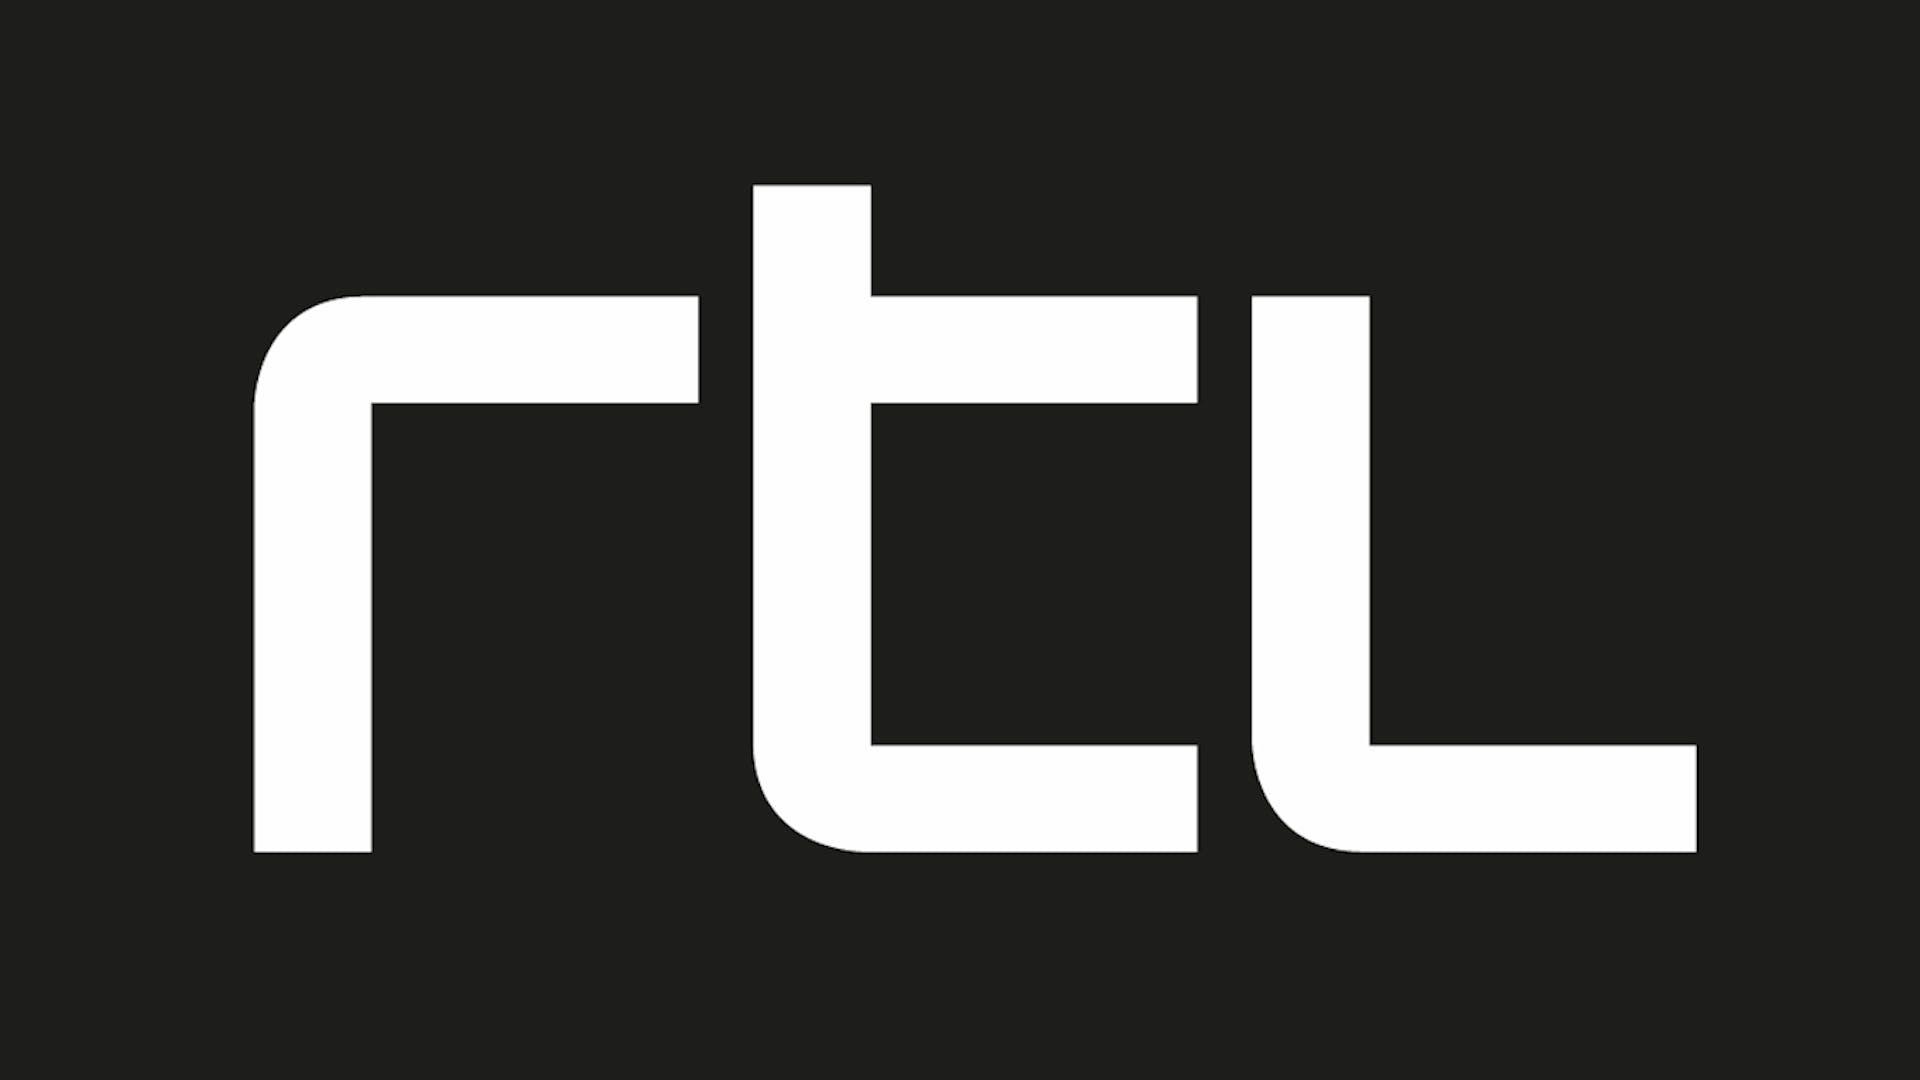 Losse RTL websites gaan op in RTL.NL - Mediasite.tv is de Veronicafansite!